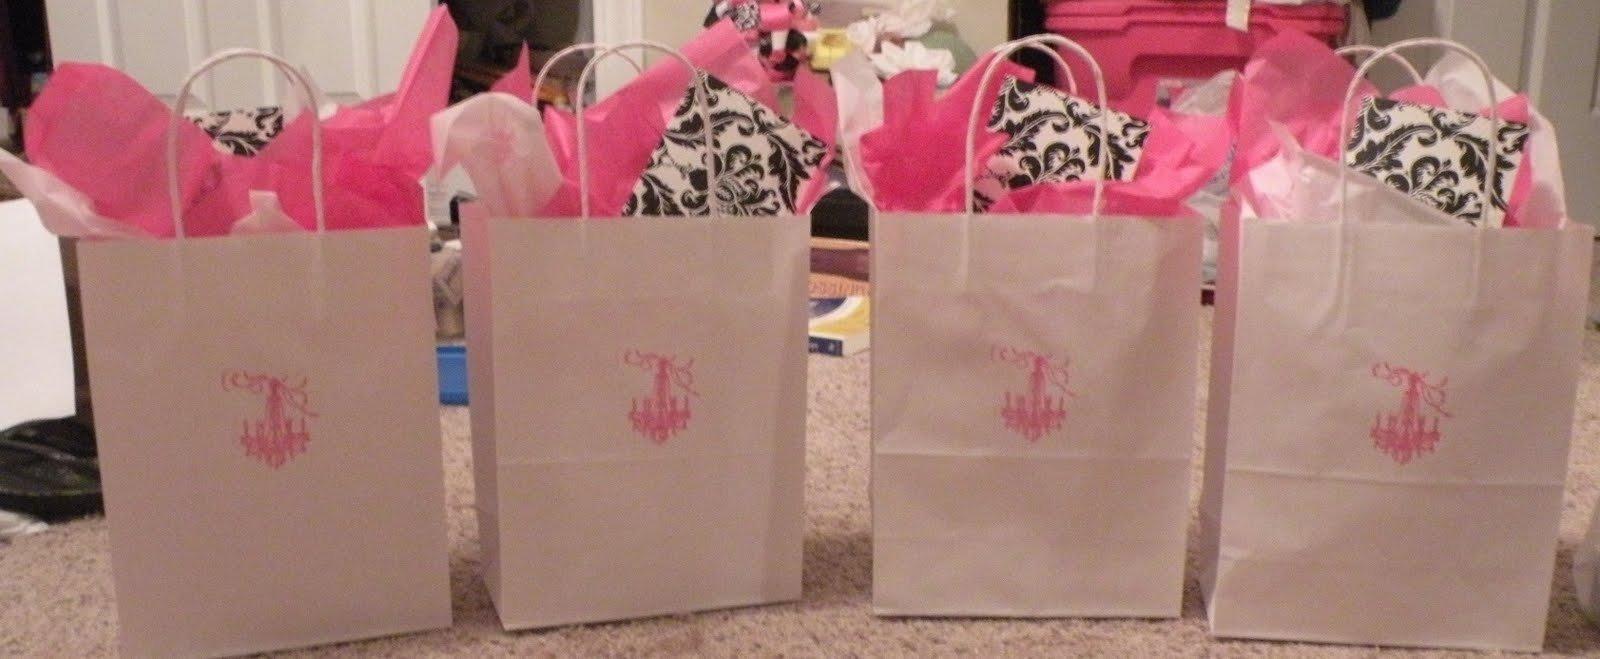 10 Pretty Hostess Gift Ideas For Bridal Shower lucky in love bridal shower hostess gifts 2020